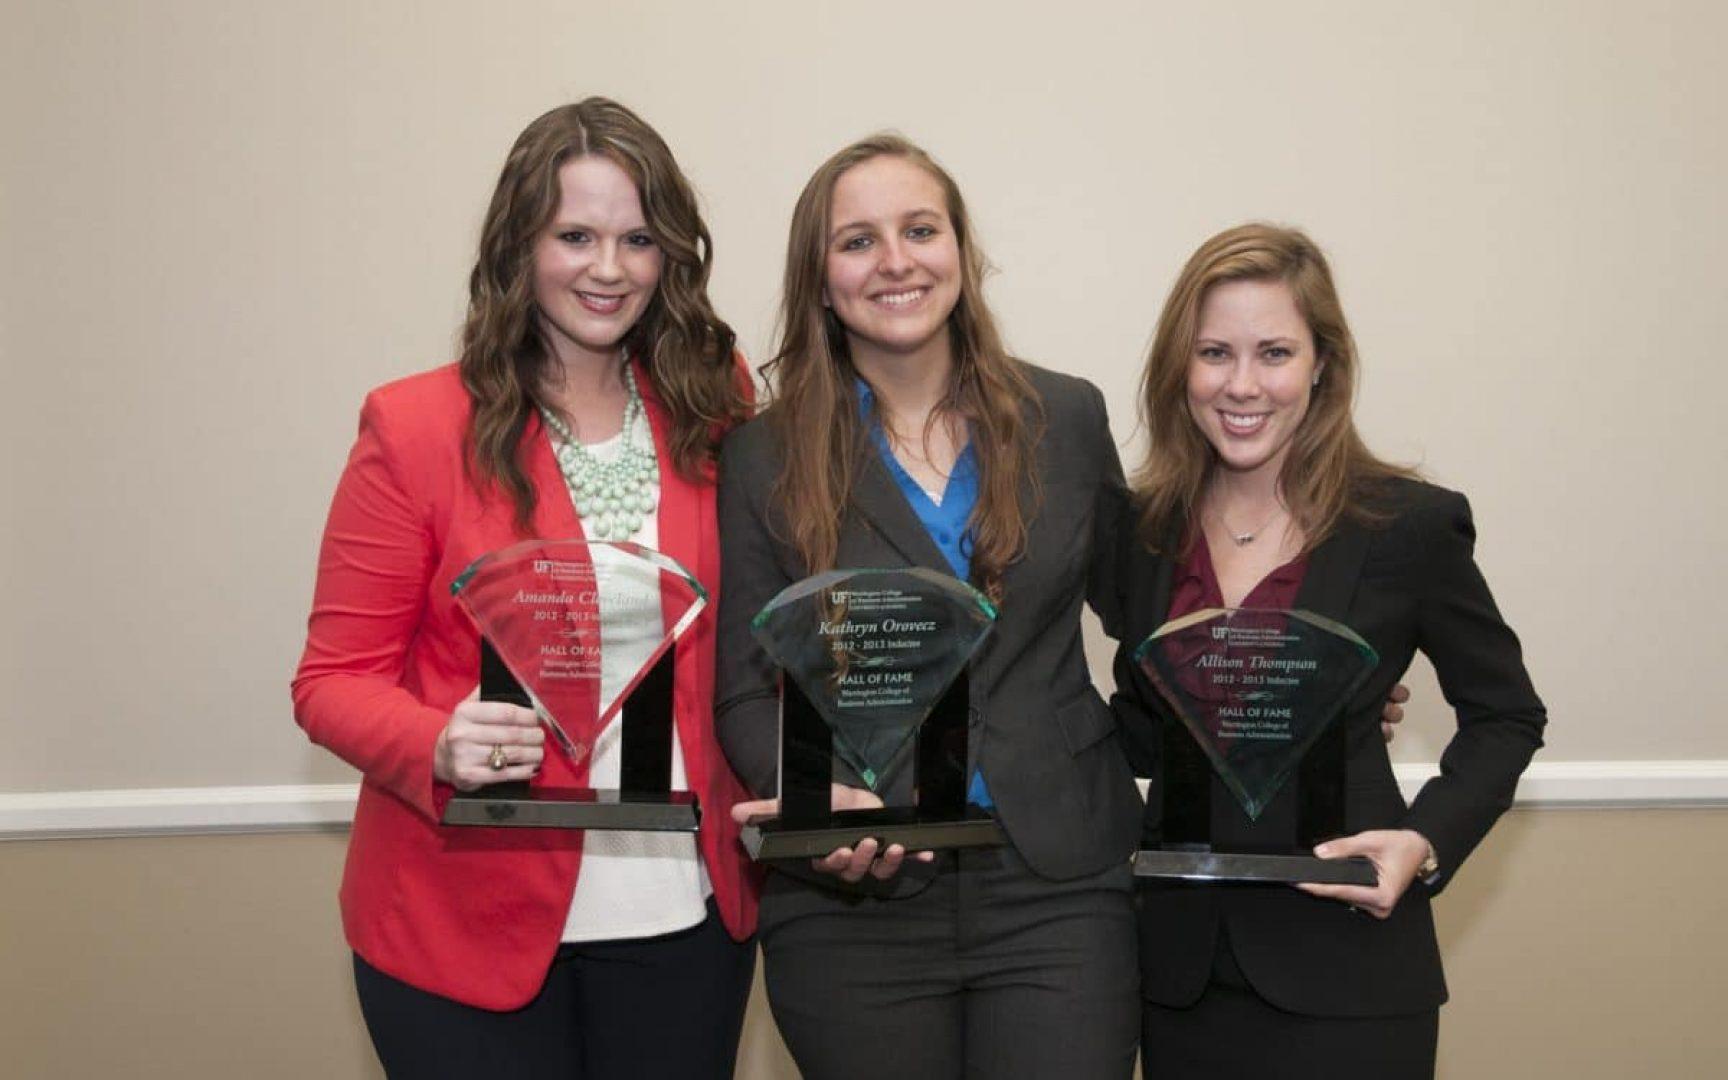 Amanda Cleveland, Katie Orovecz, and Ali Thompson